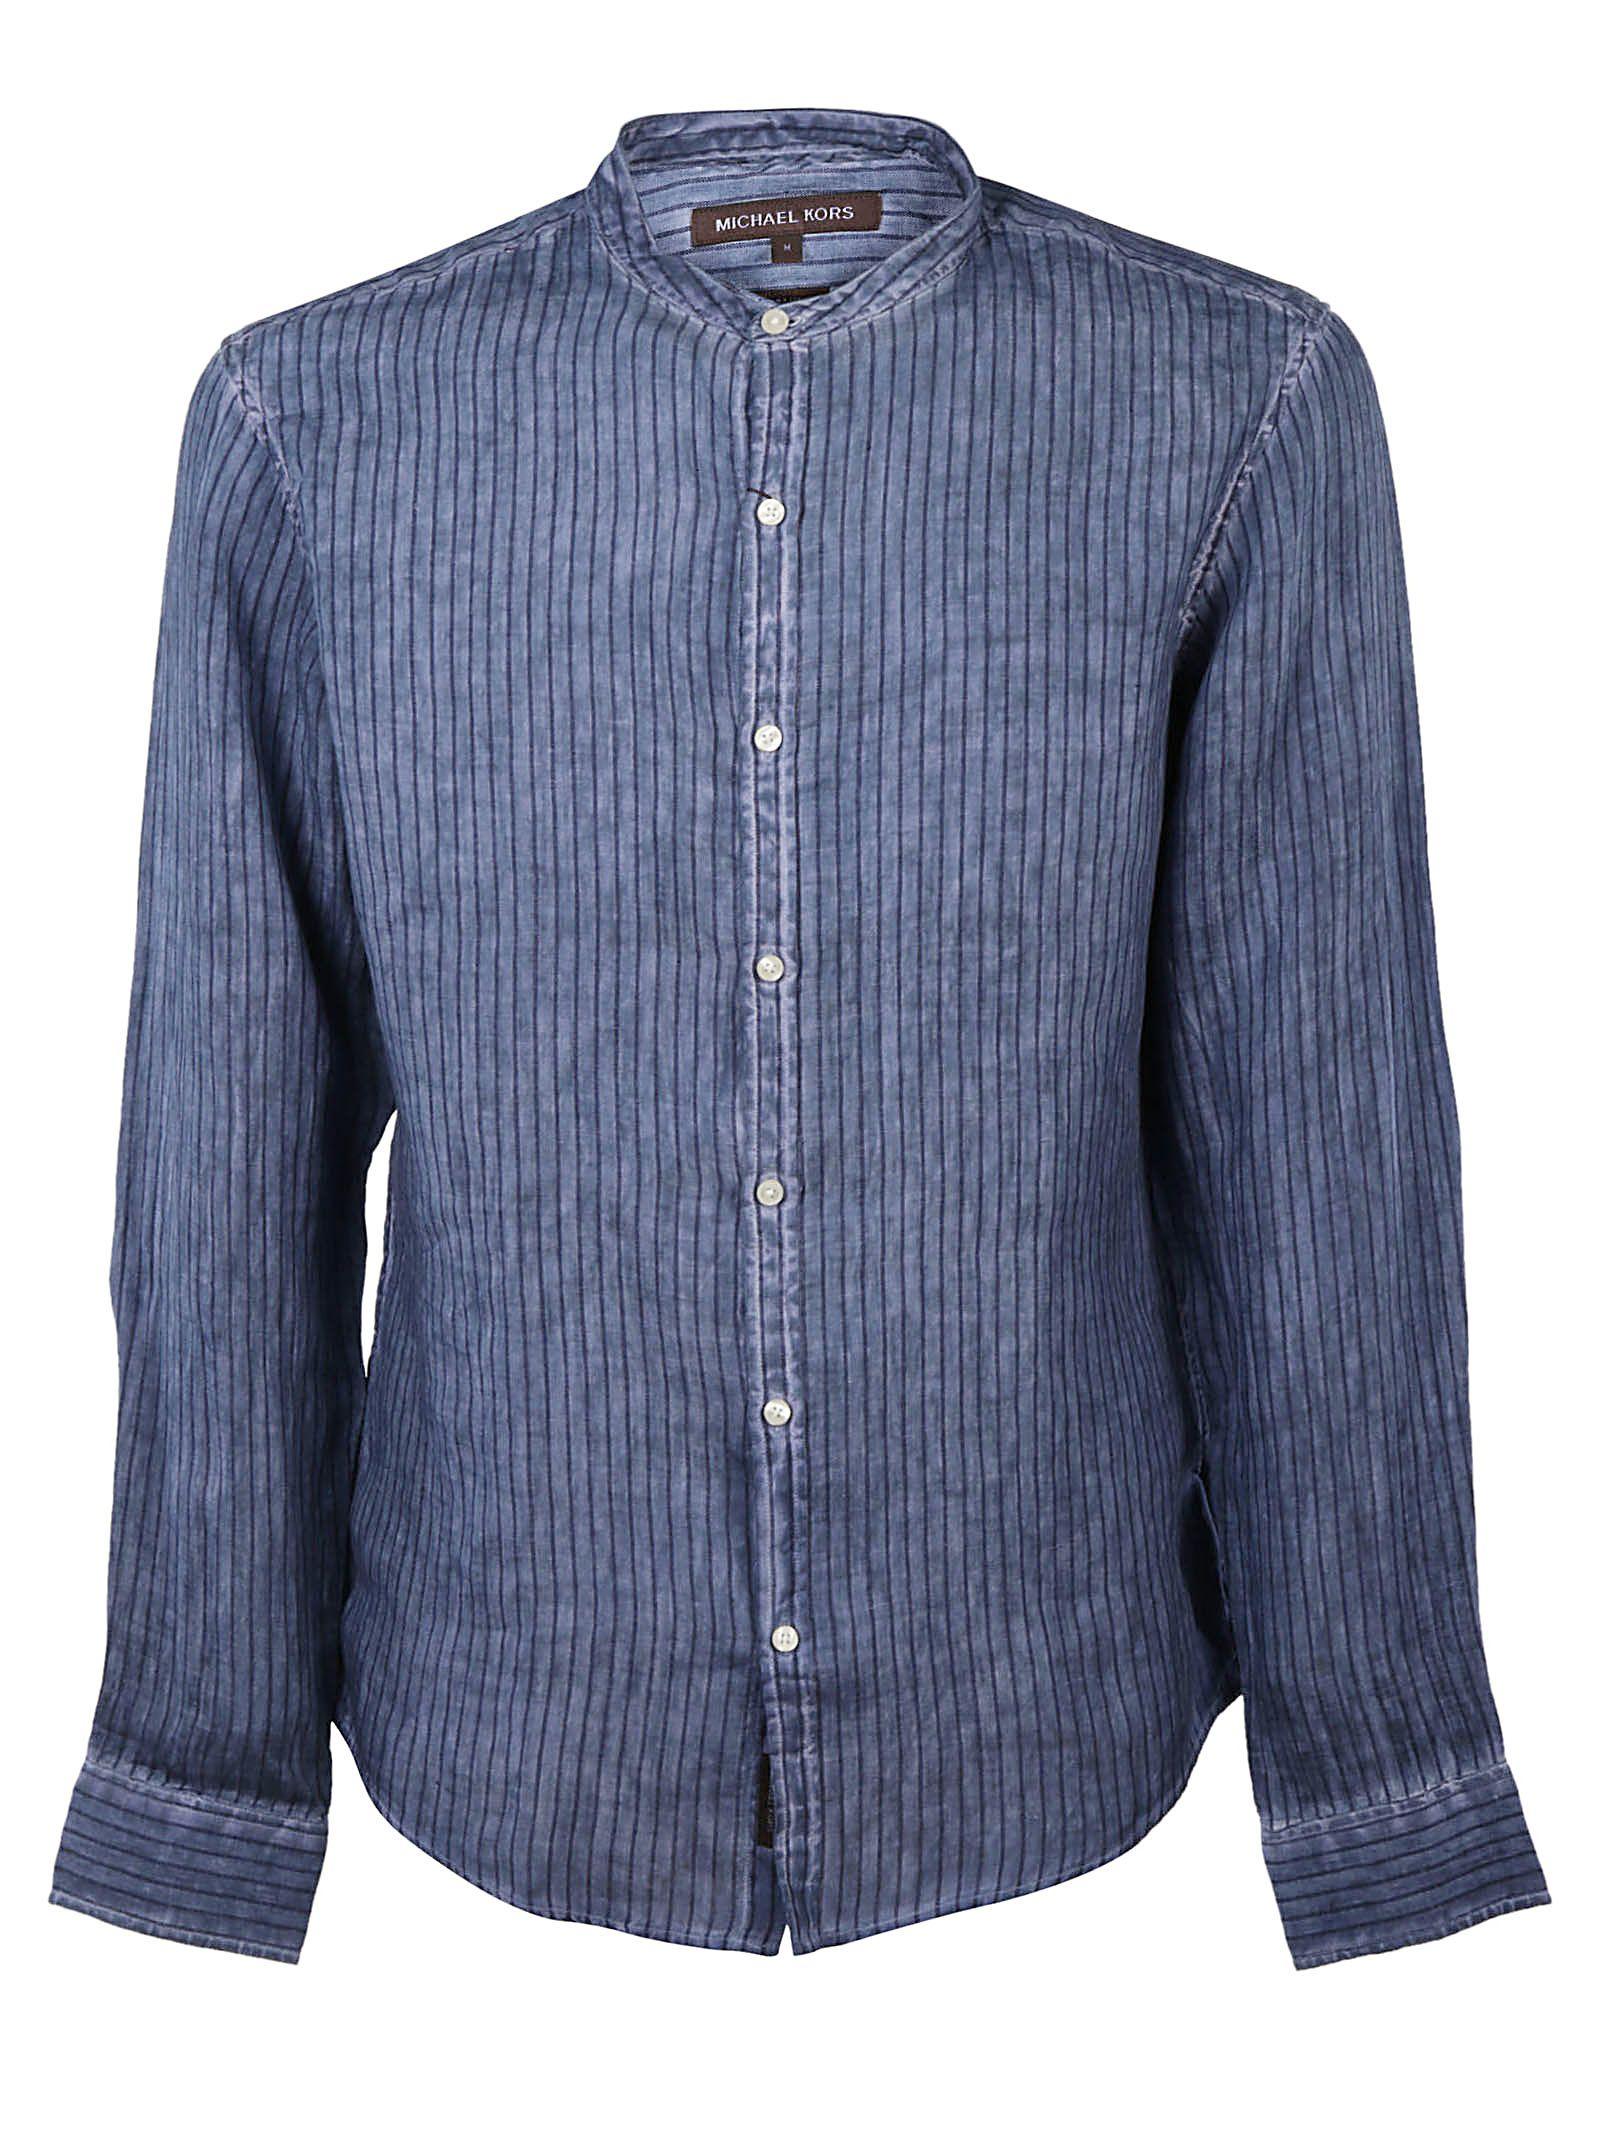 Michael Kors Striped Shirt